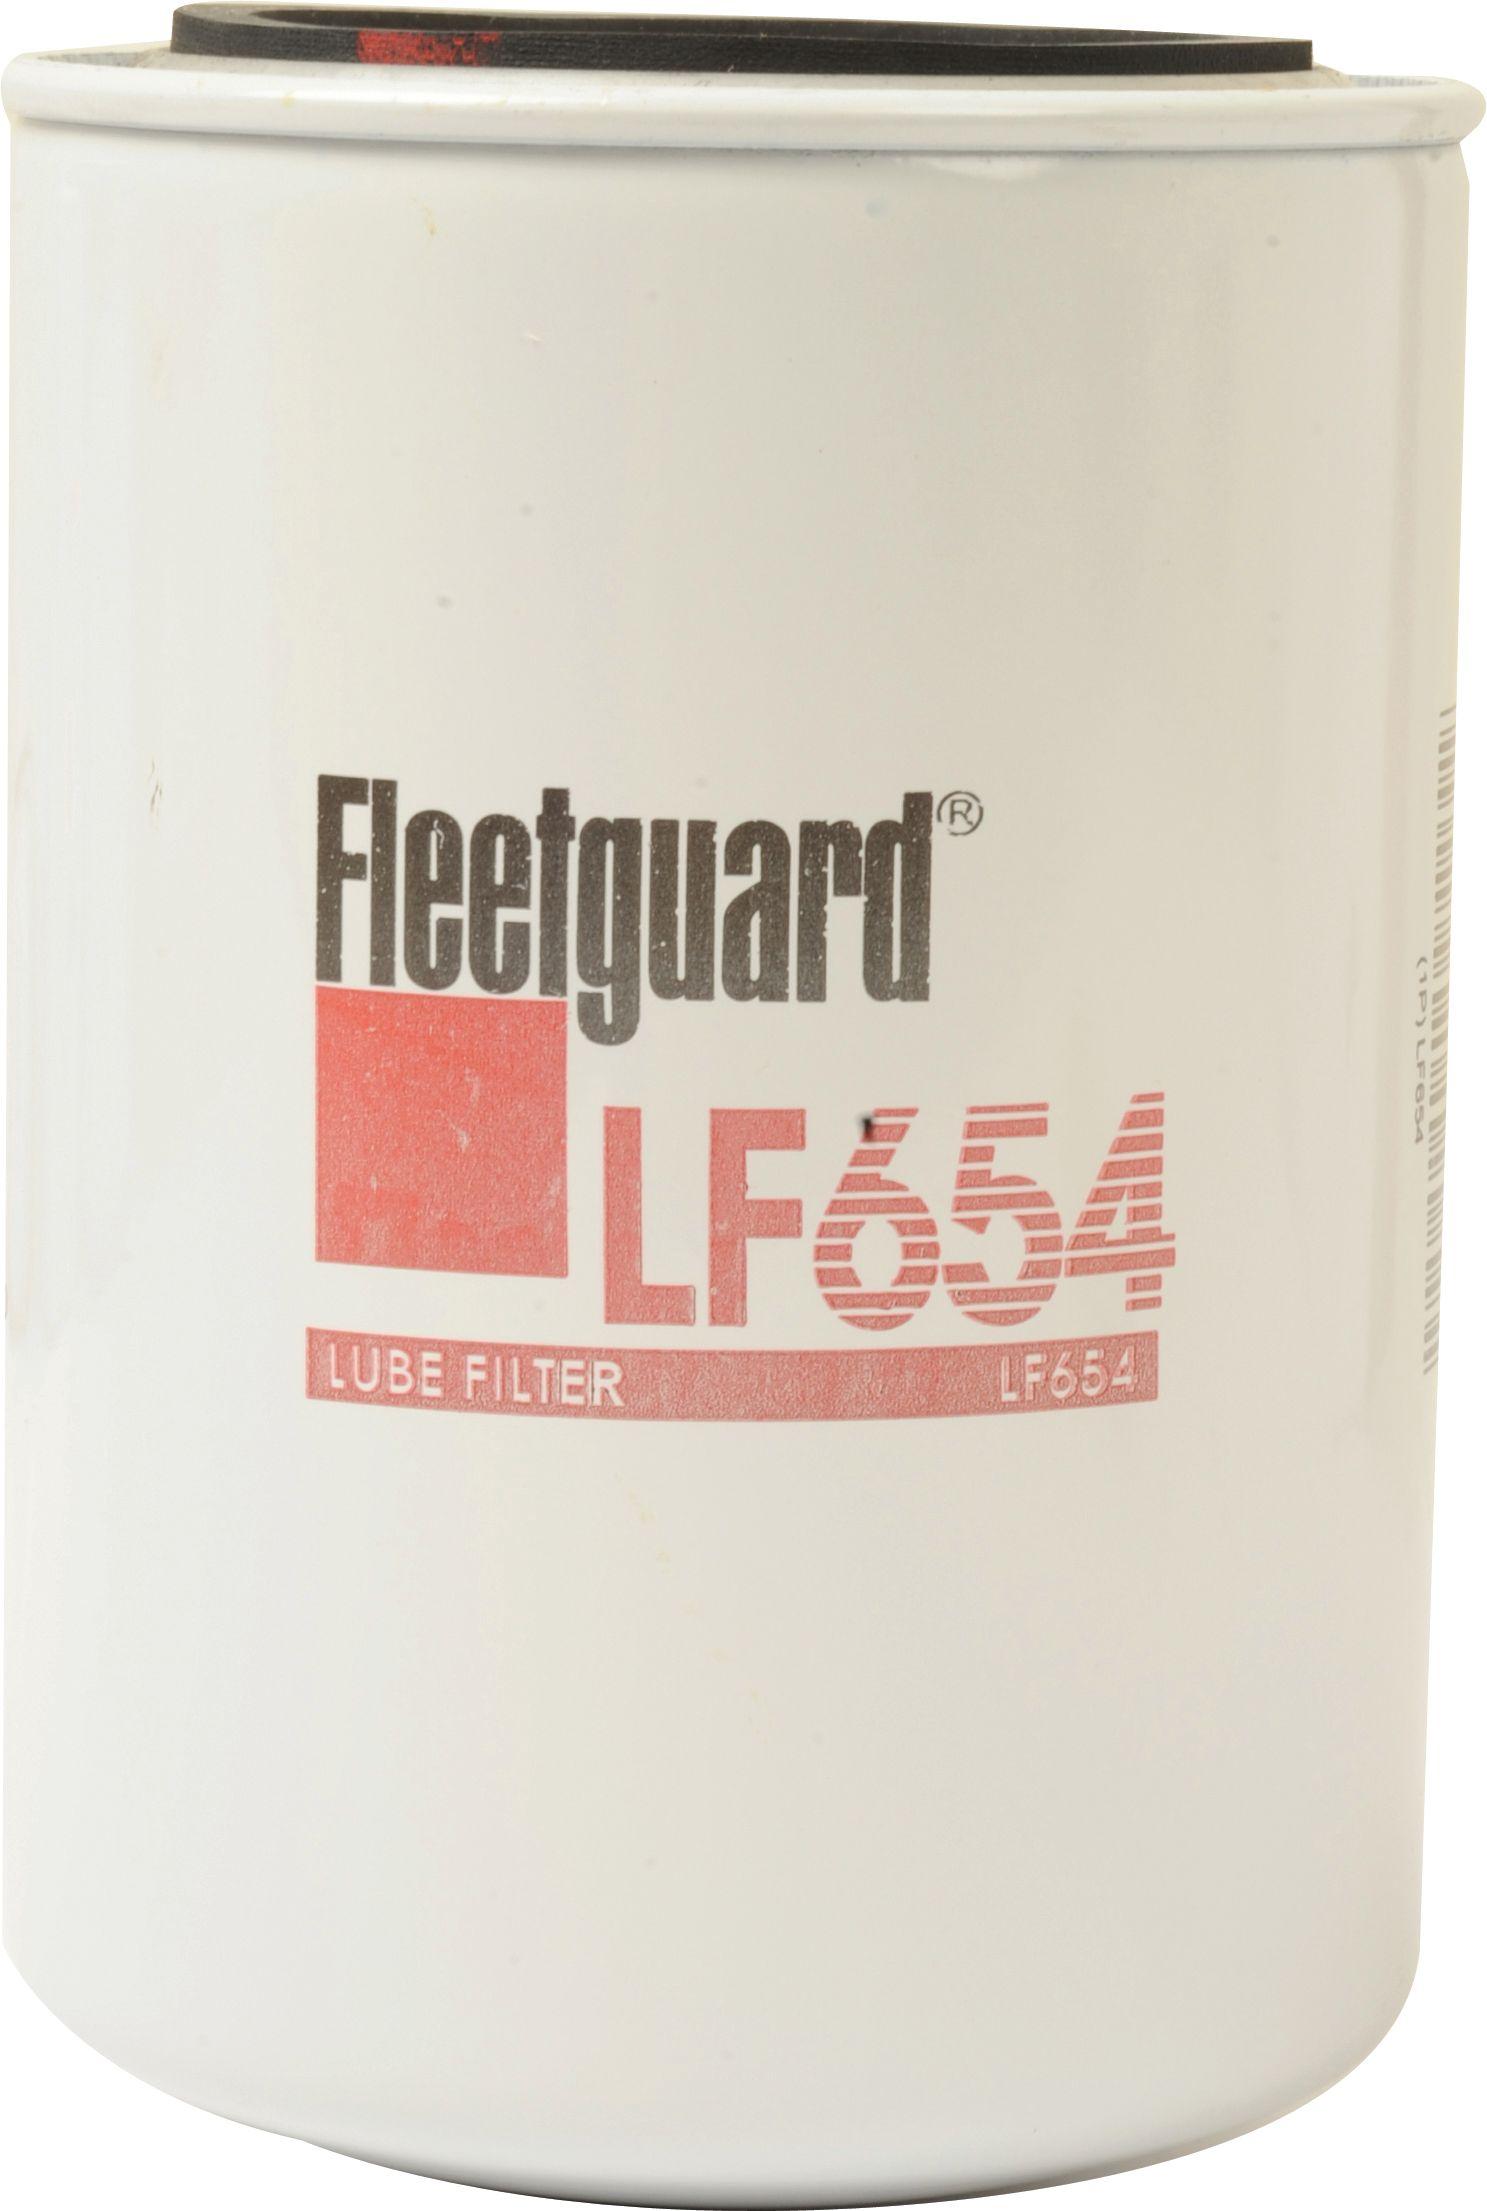 CASE IH OIL FILTER LF654 109500